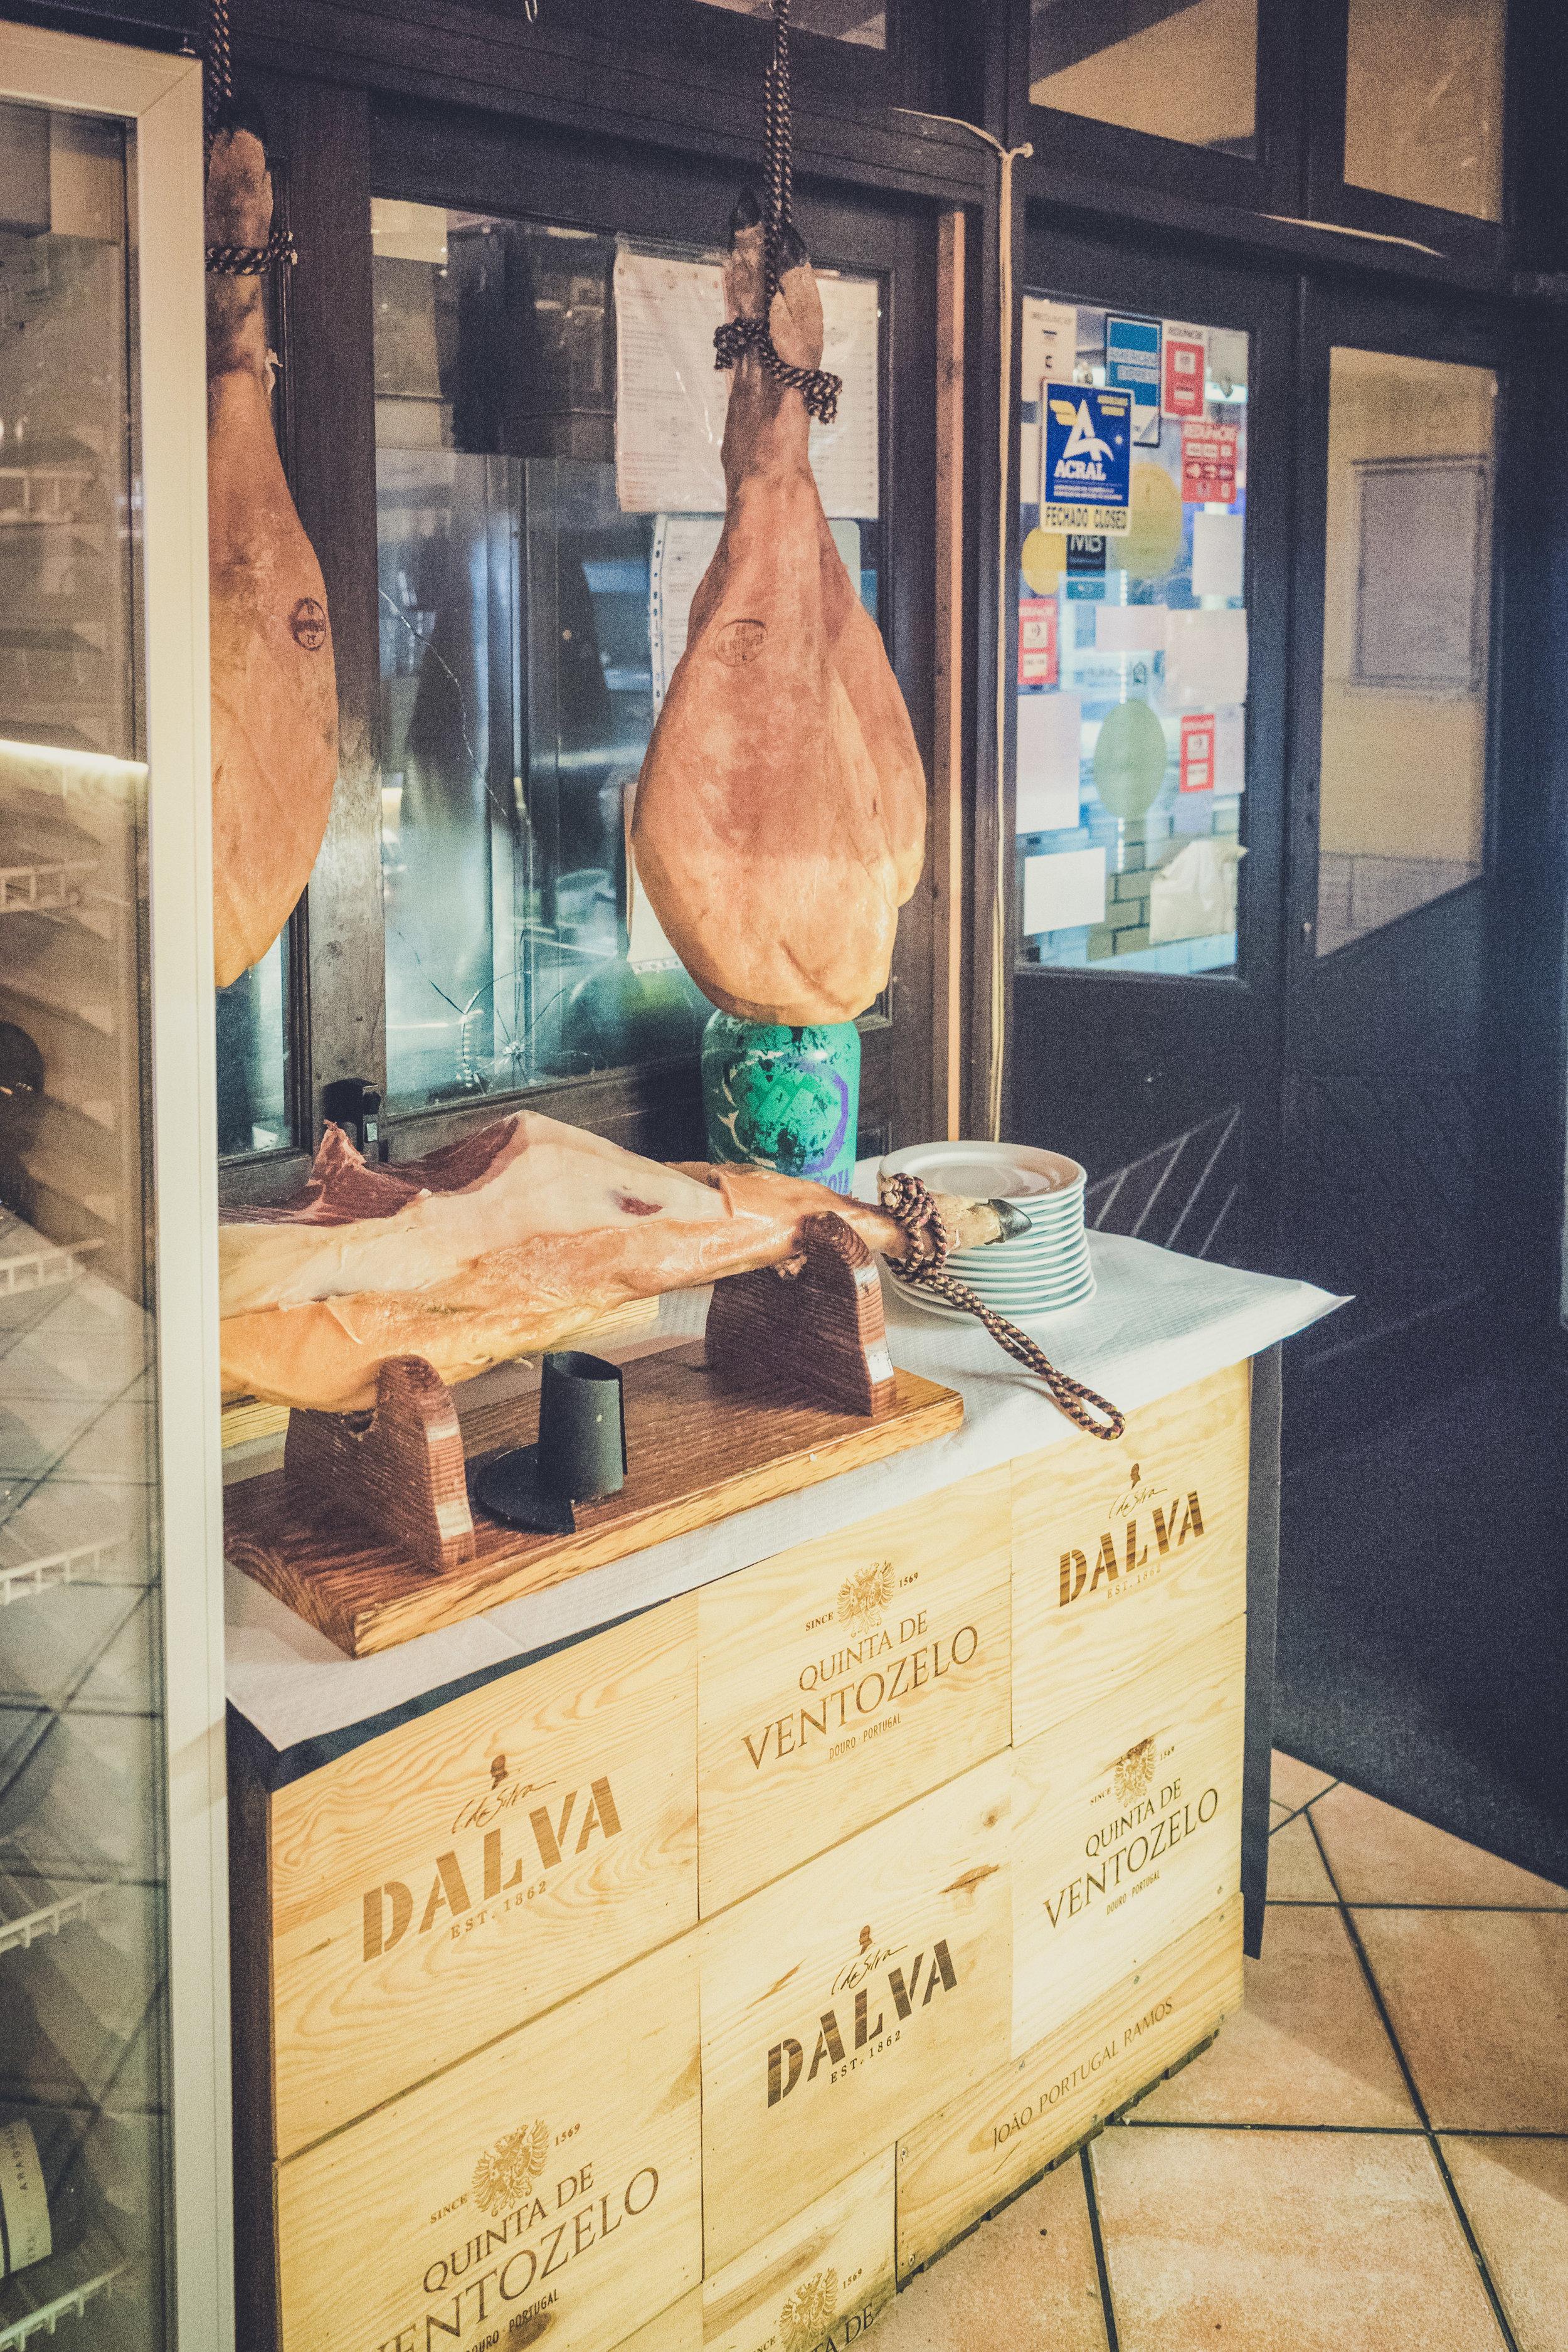 monchique portugal restaurante luar da foia. good food in monchique. fun times. hanging meats. fresh meat.jpg